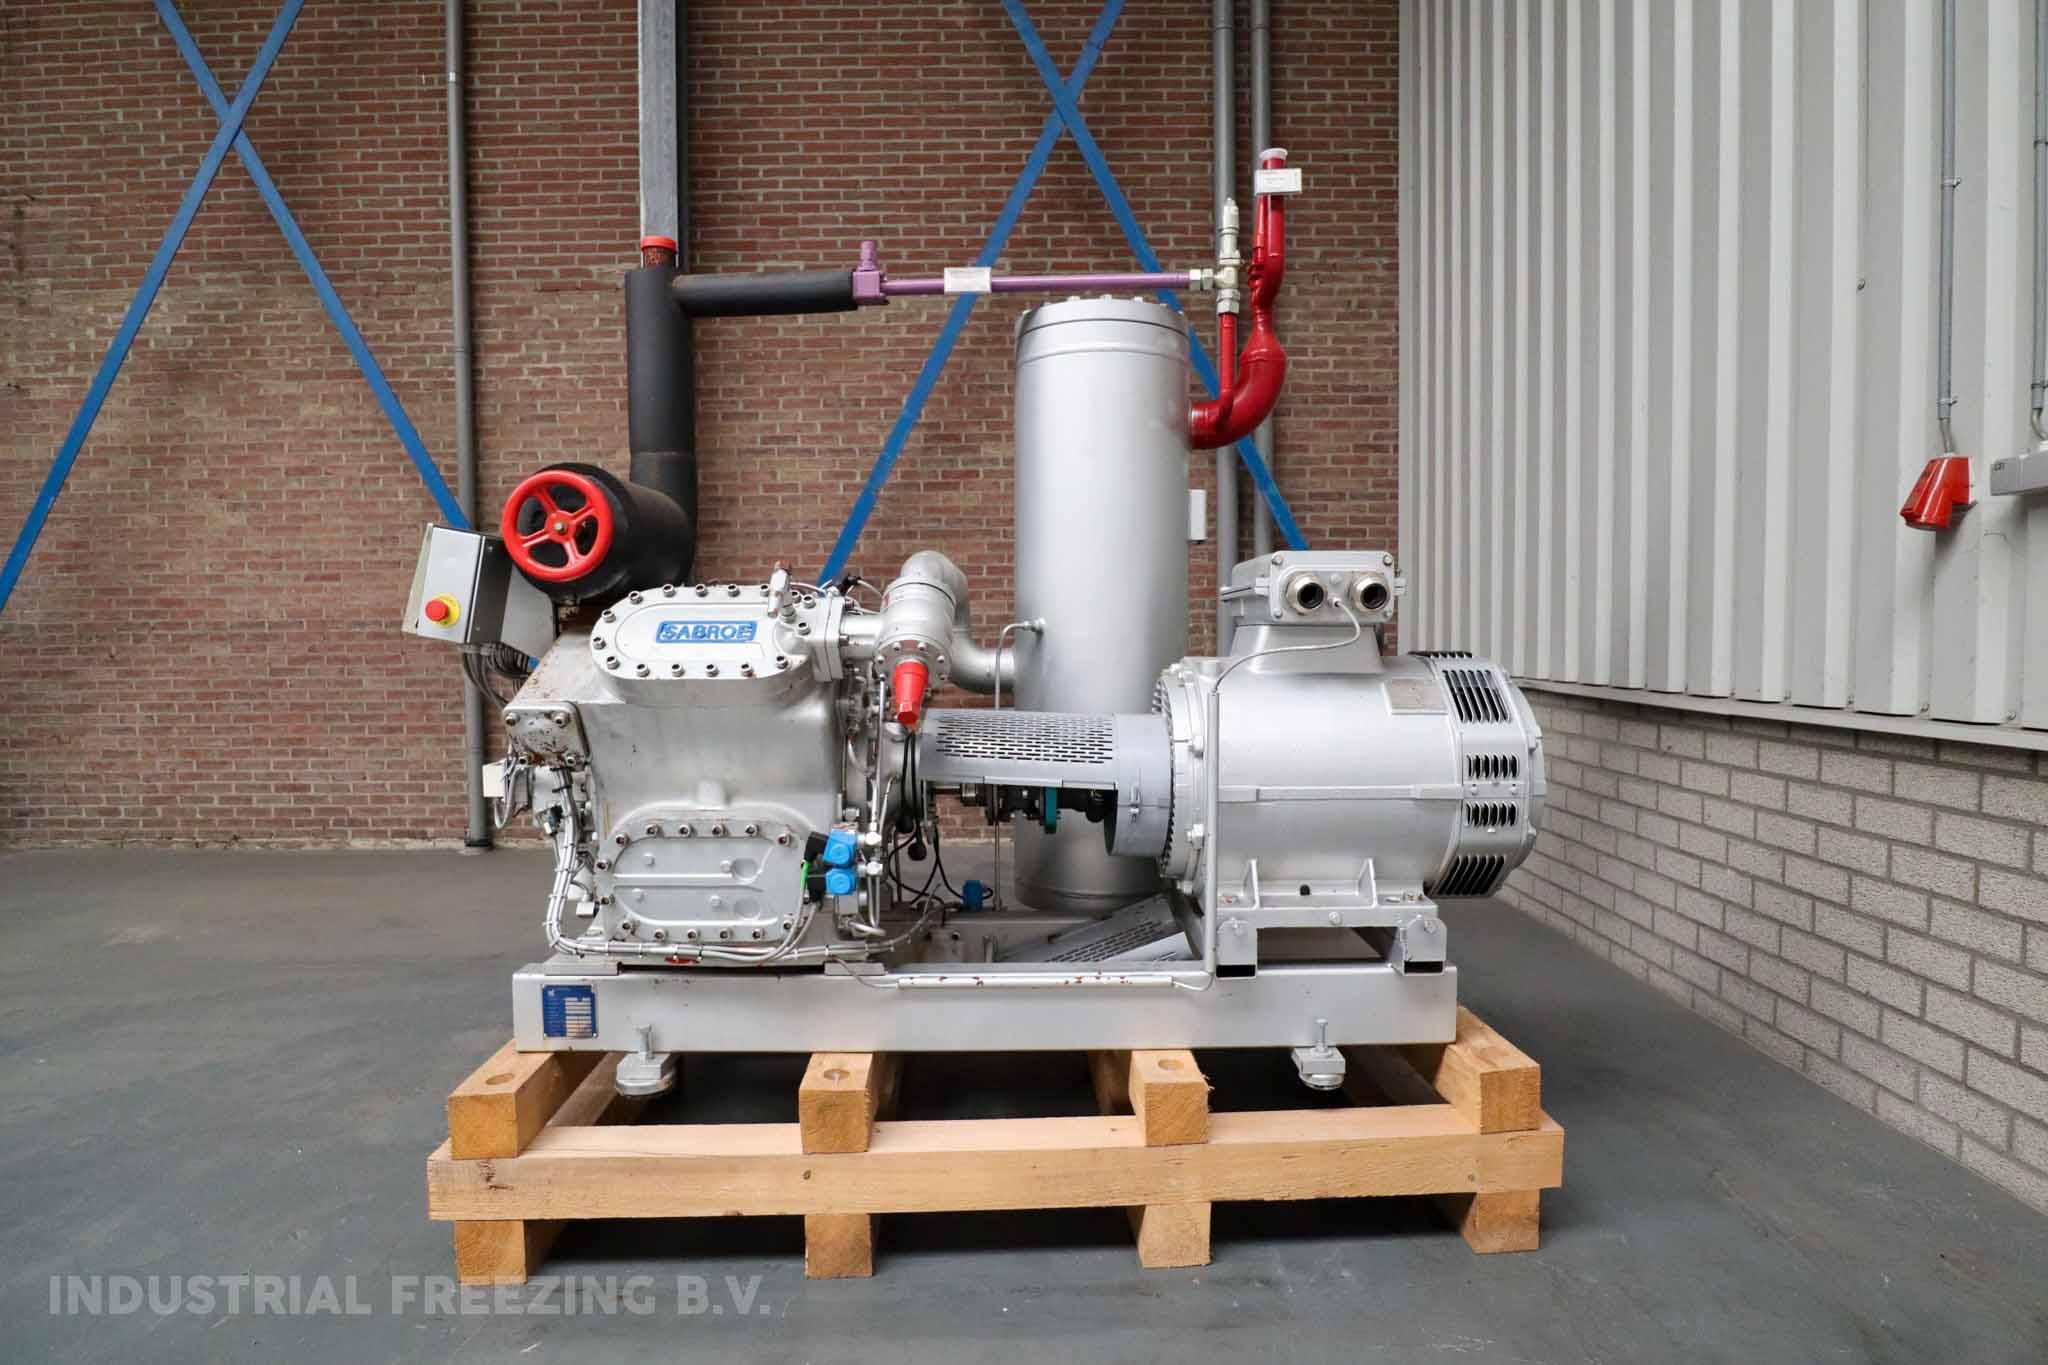 Sabroe HPC 104S Cooling Compressor